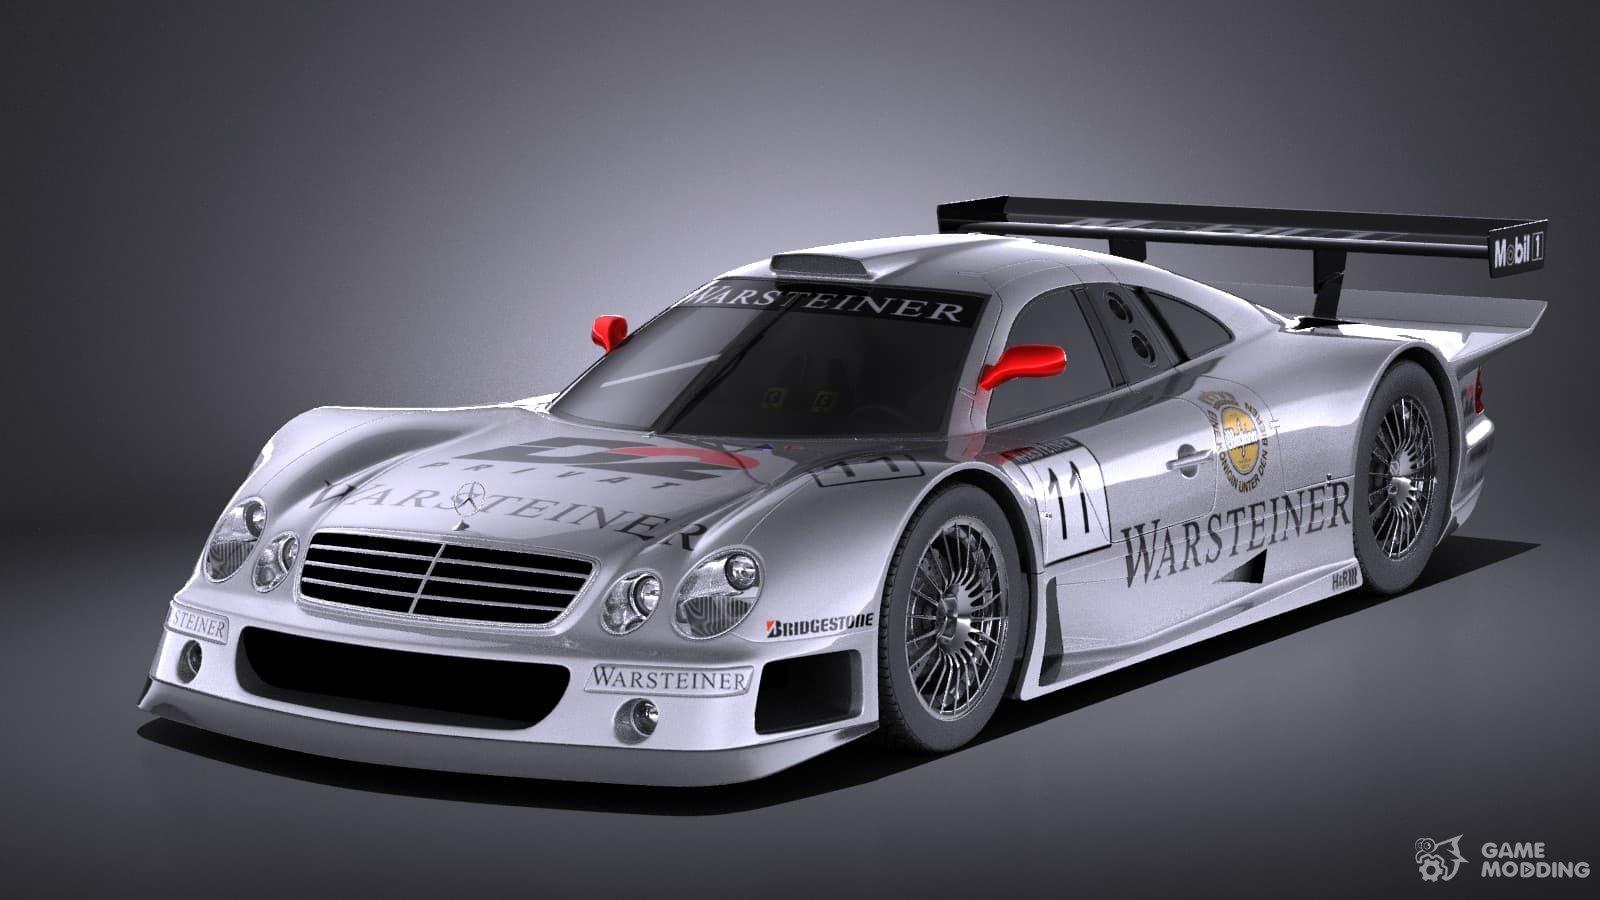 Mercedes Benz Clk Gtr Super Sport De Sonido En Interiores